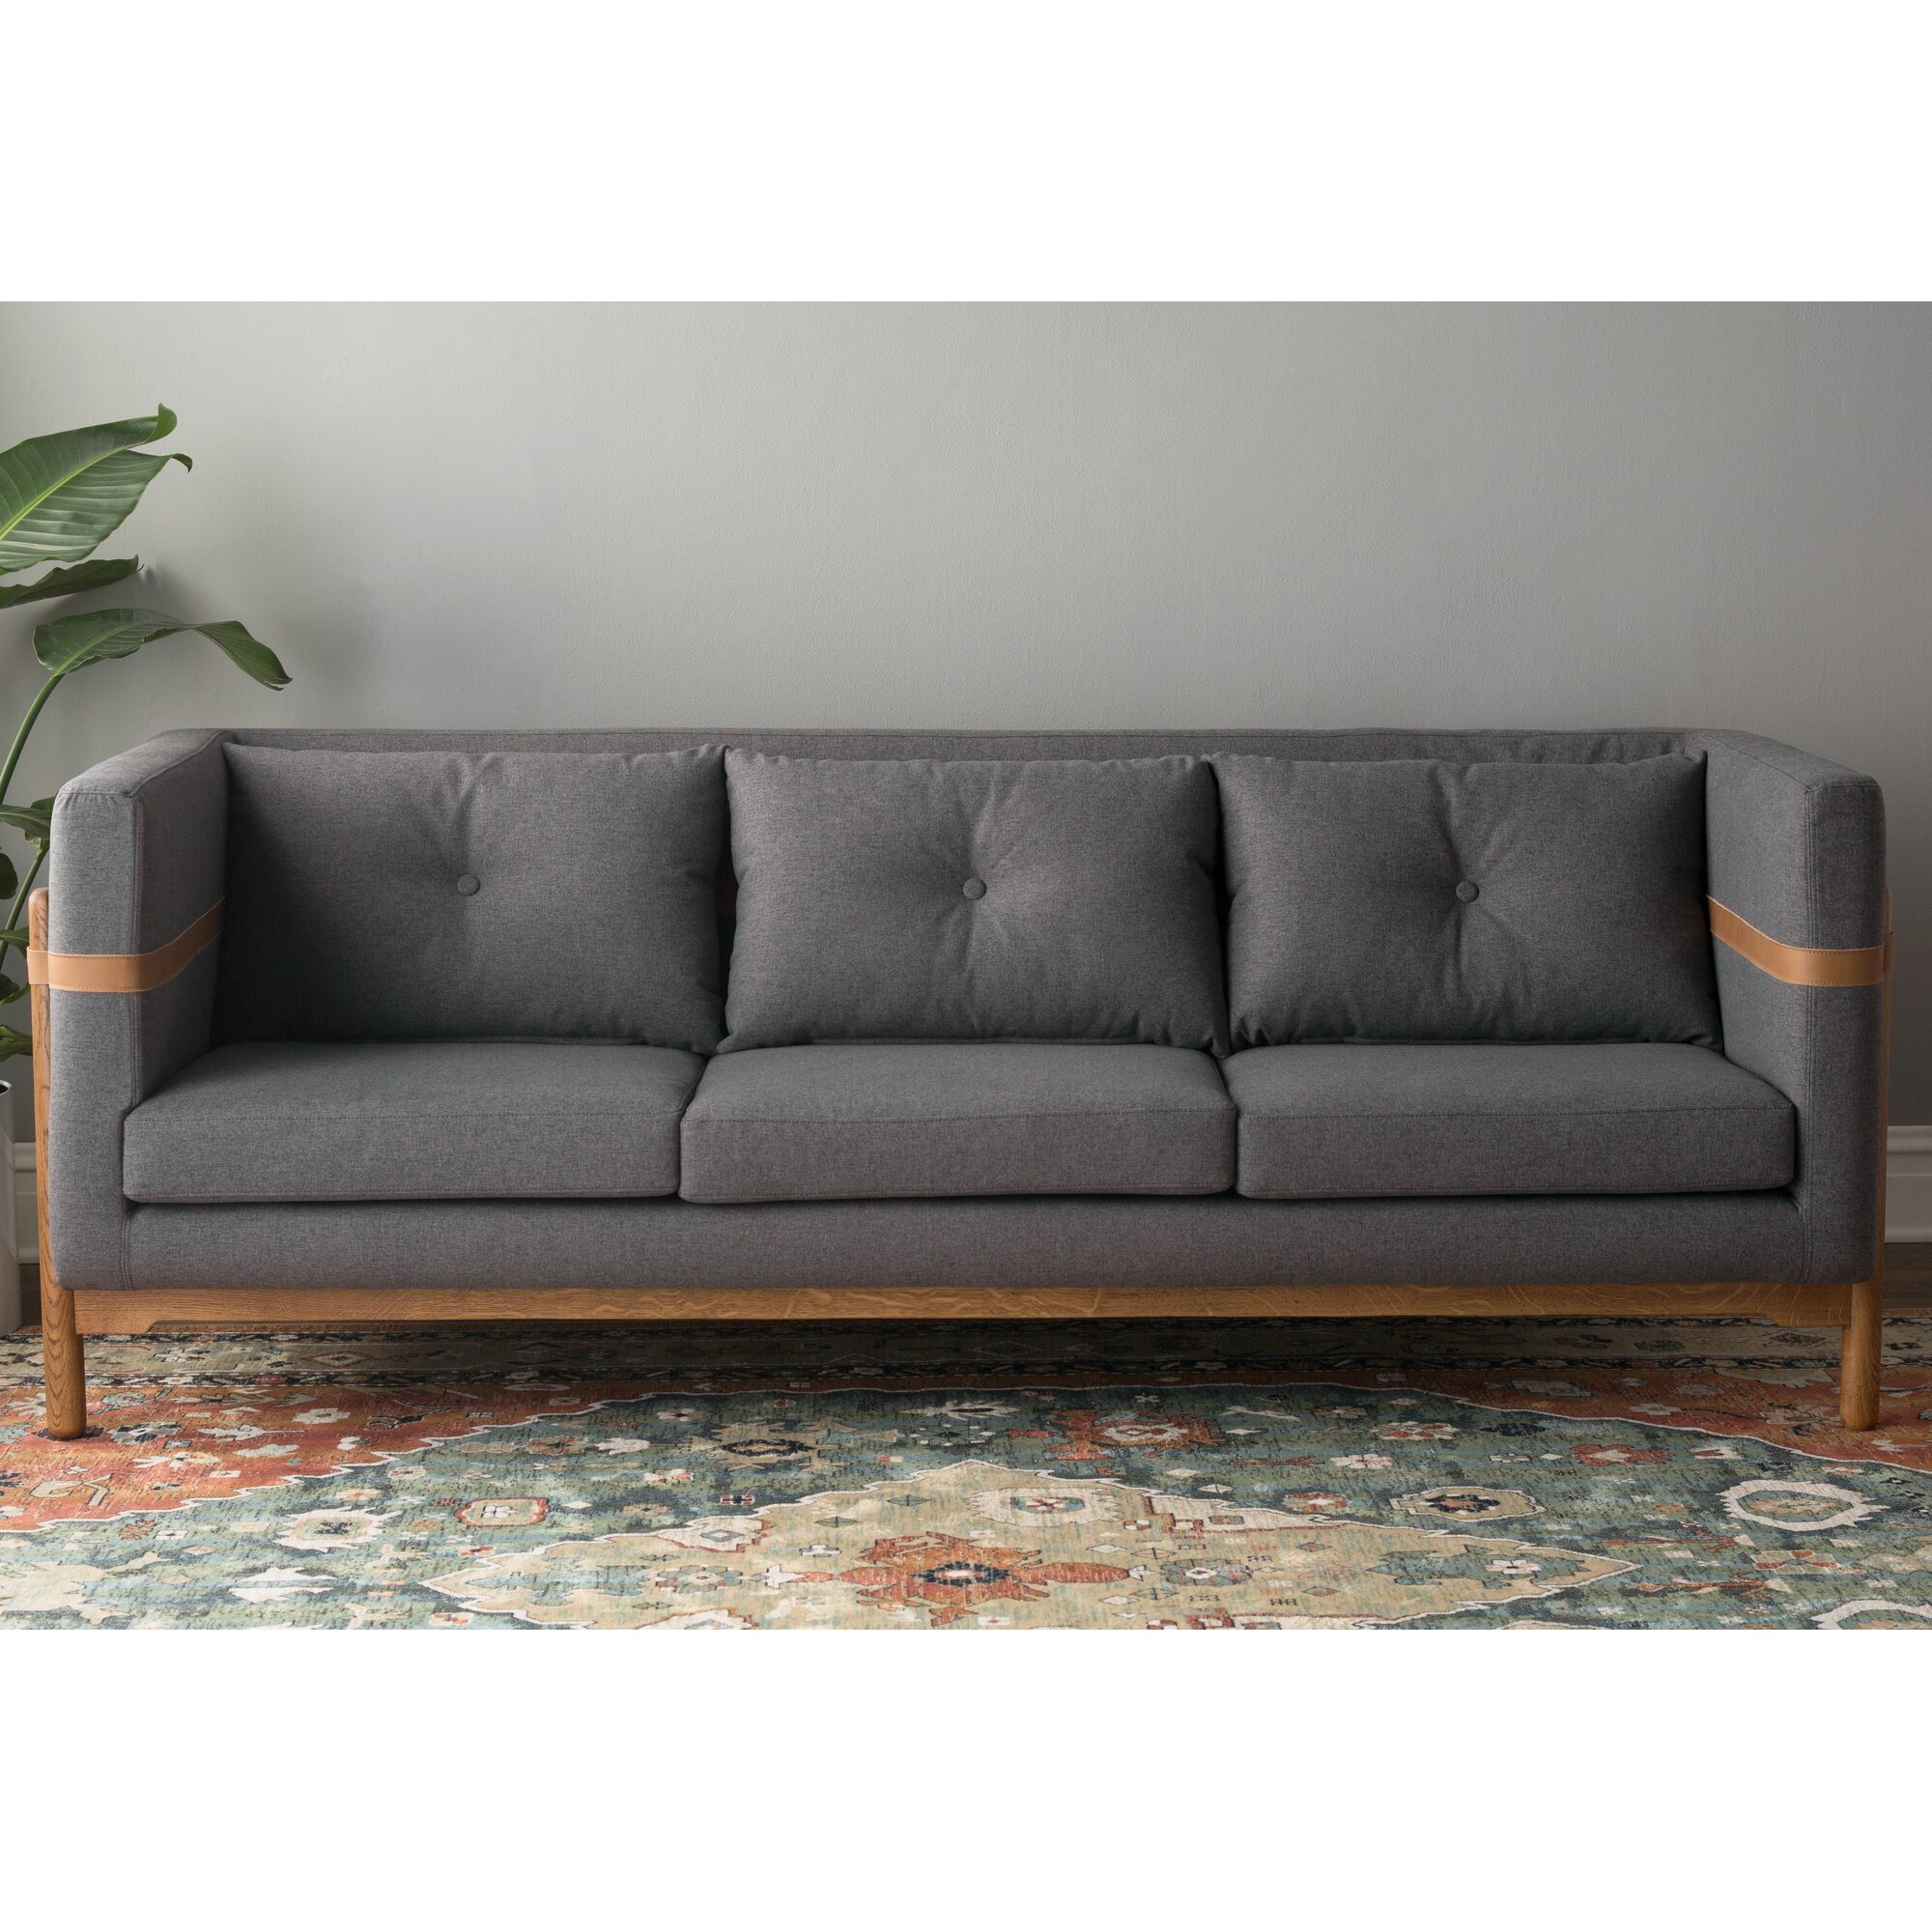 Classic Modern Sofa Instasofas